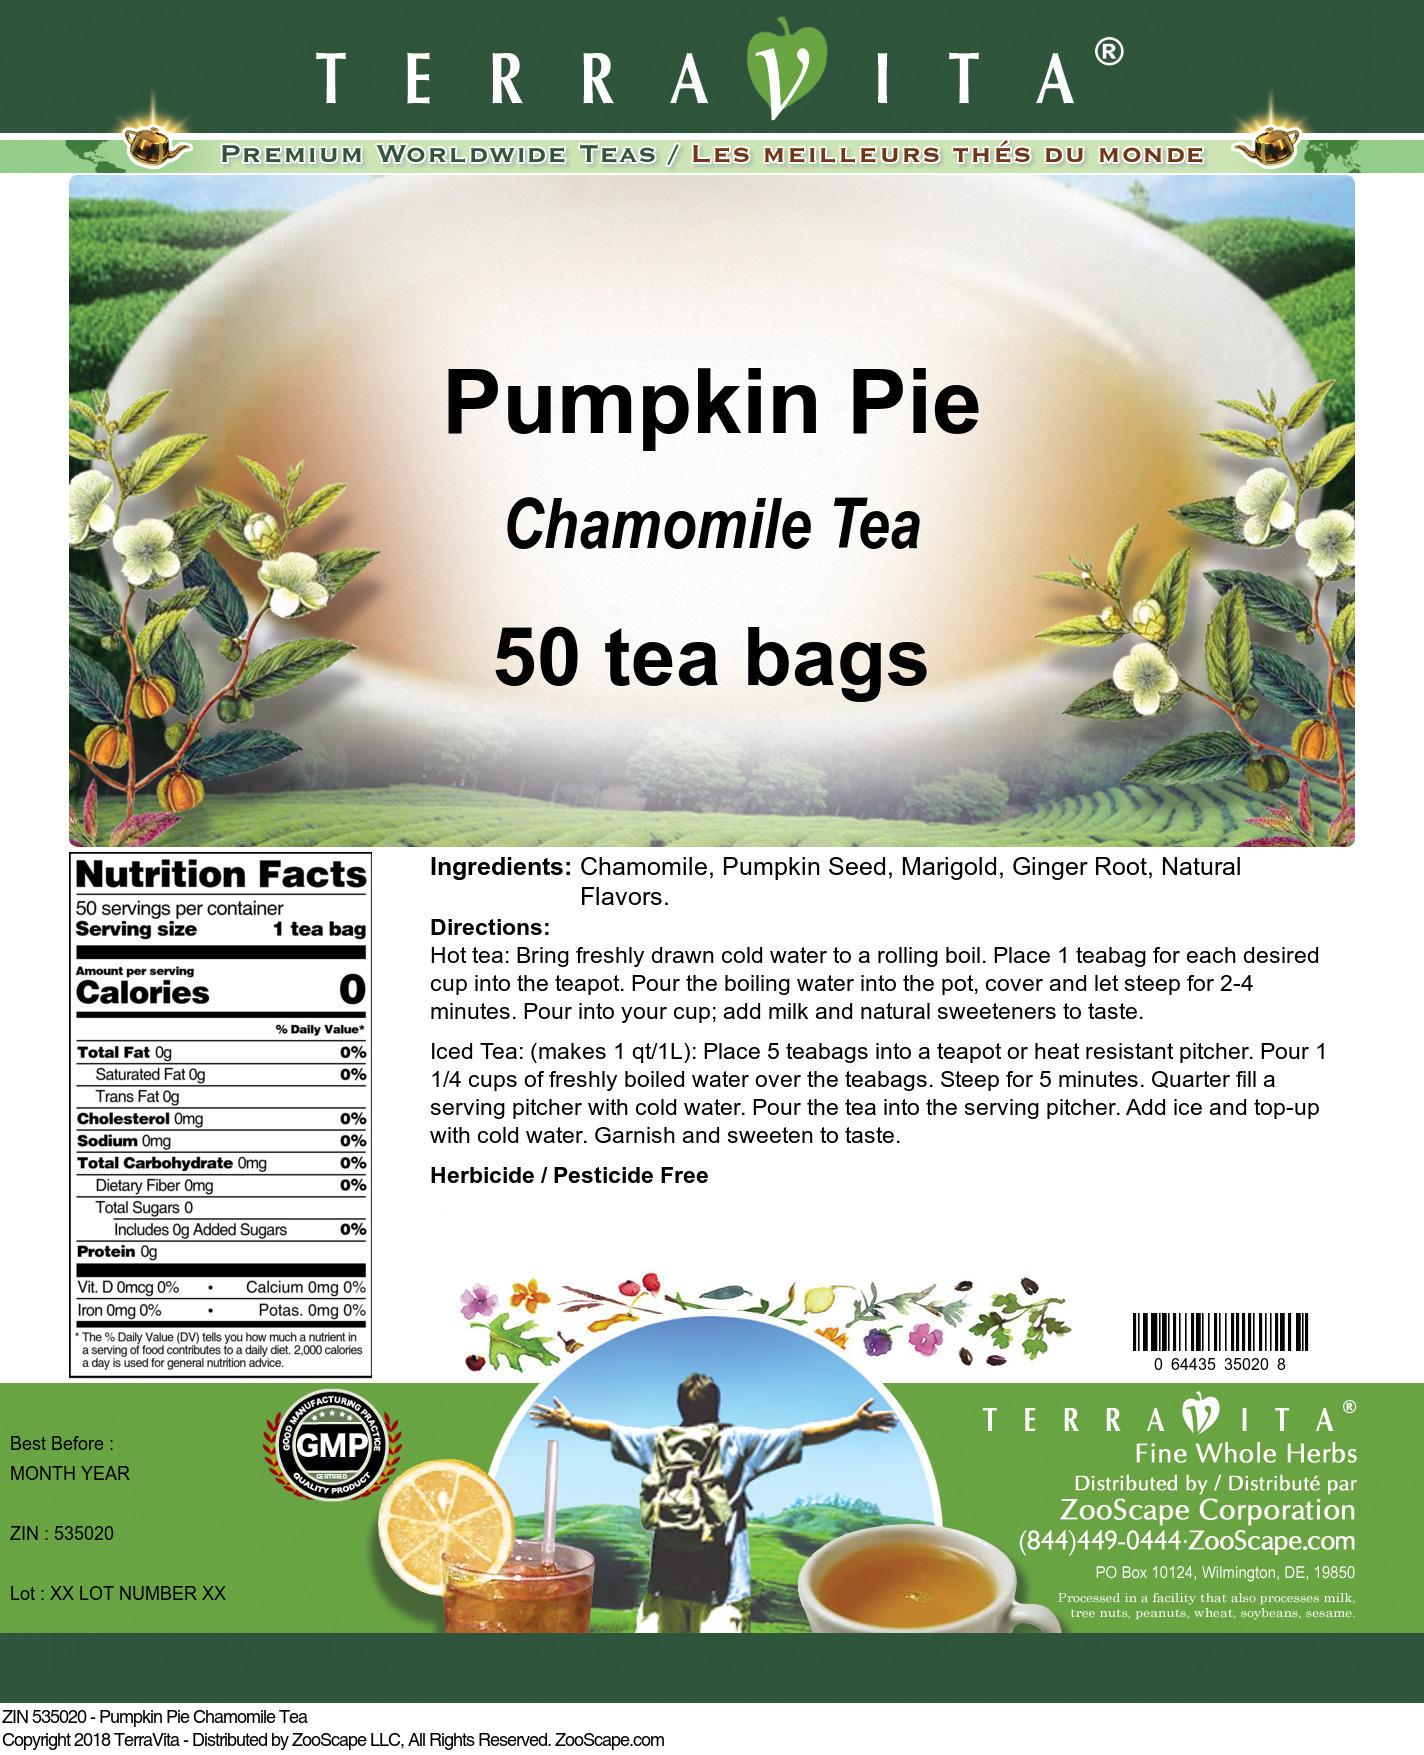 Pumpkin Pie Chamomile Tea